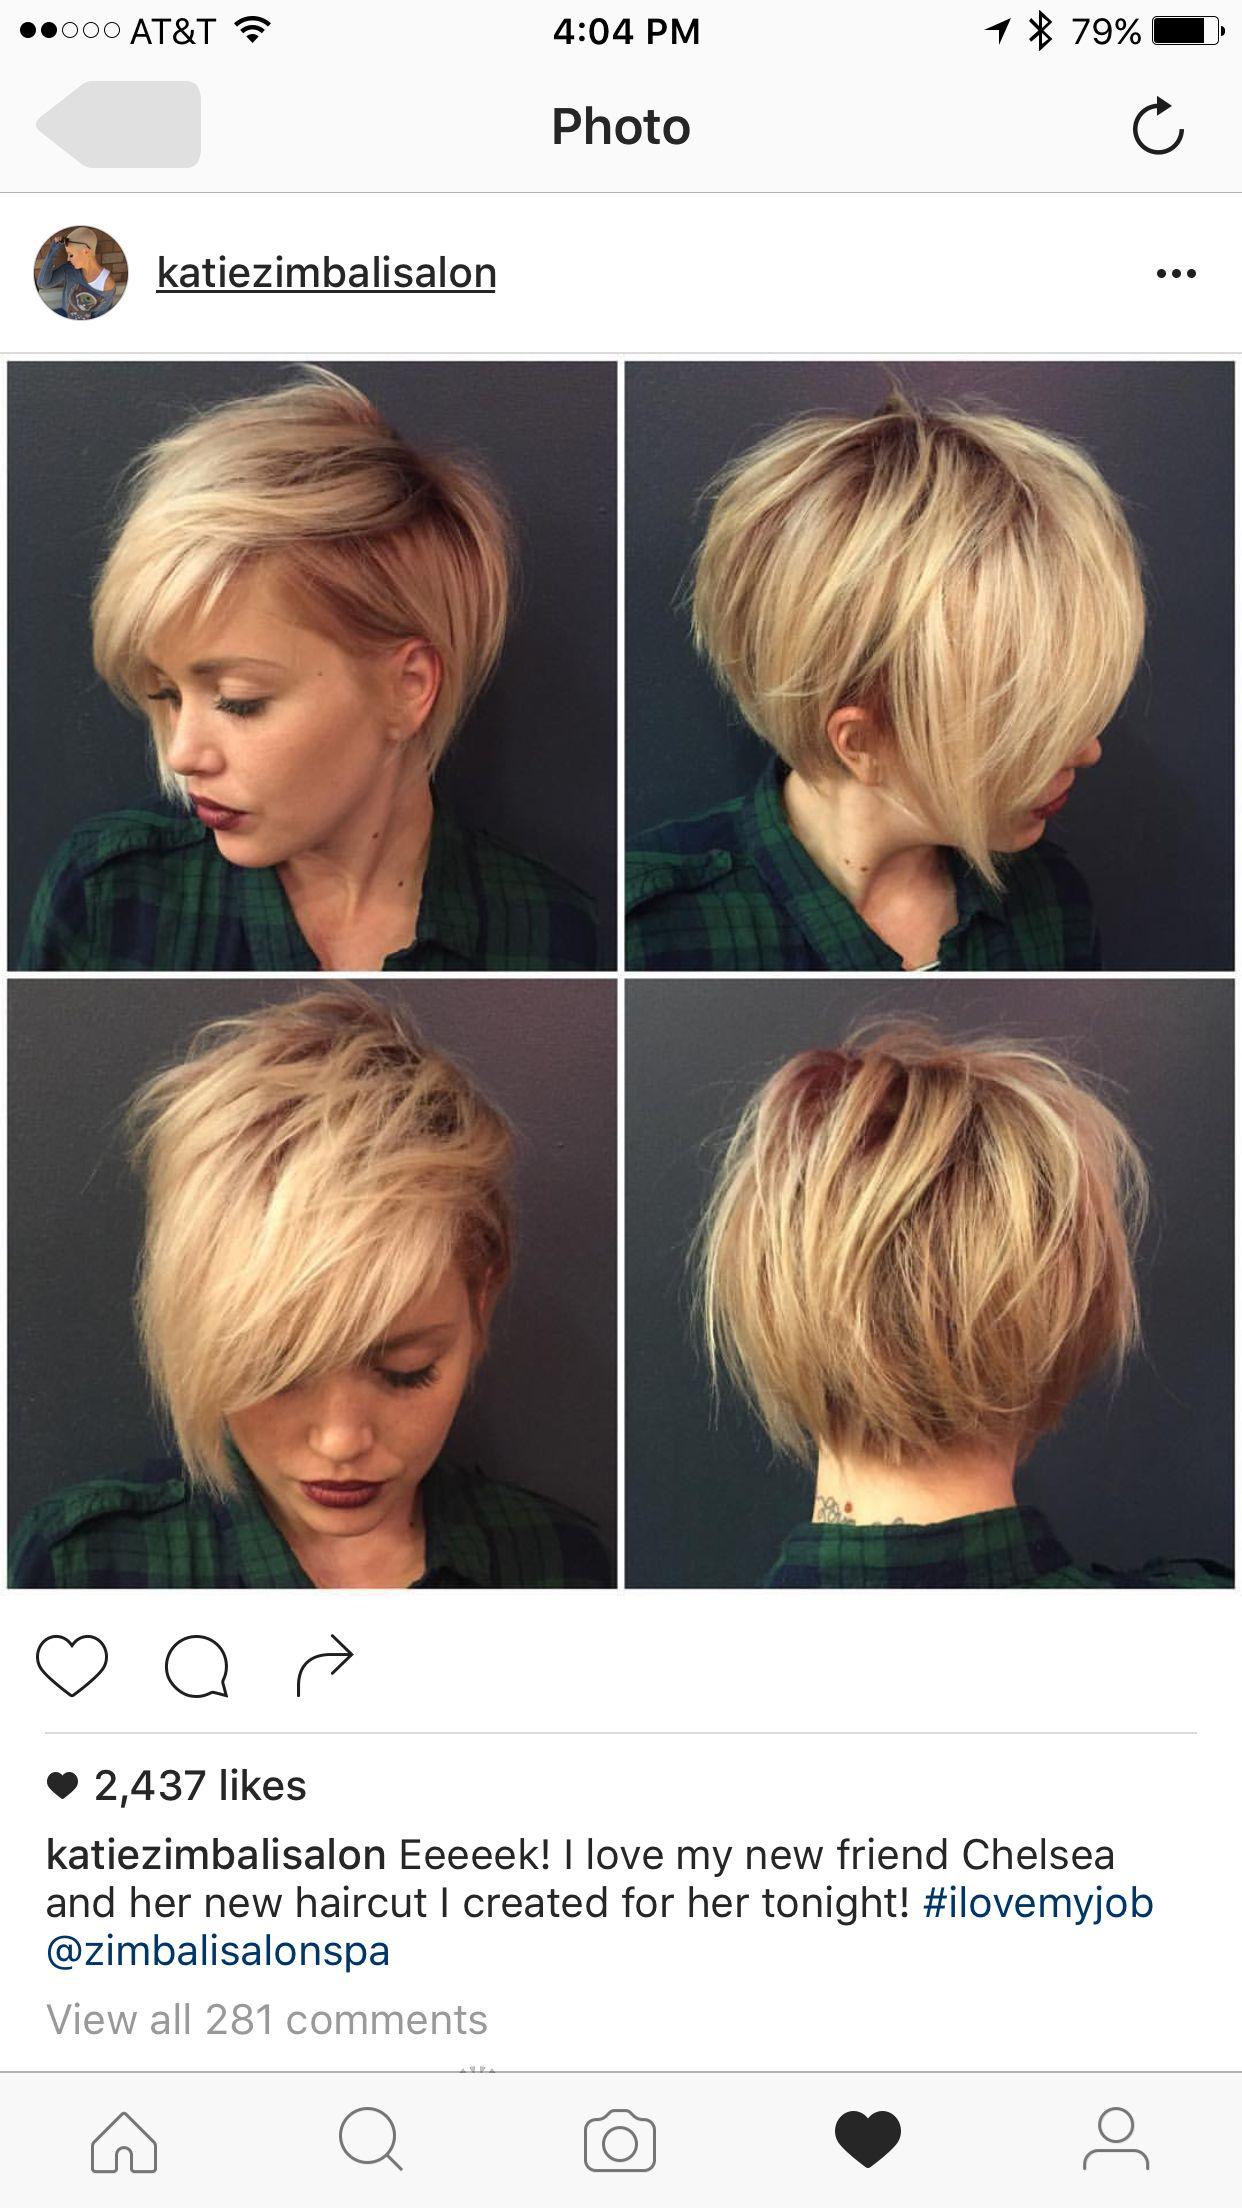 Pin by Tia Klinger on hurrr  Pinterest  Haircuts Hair cuts and